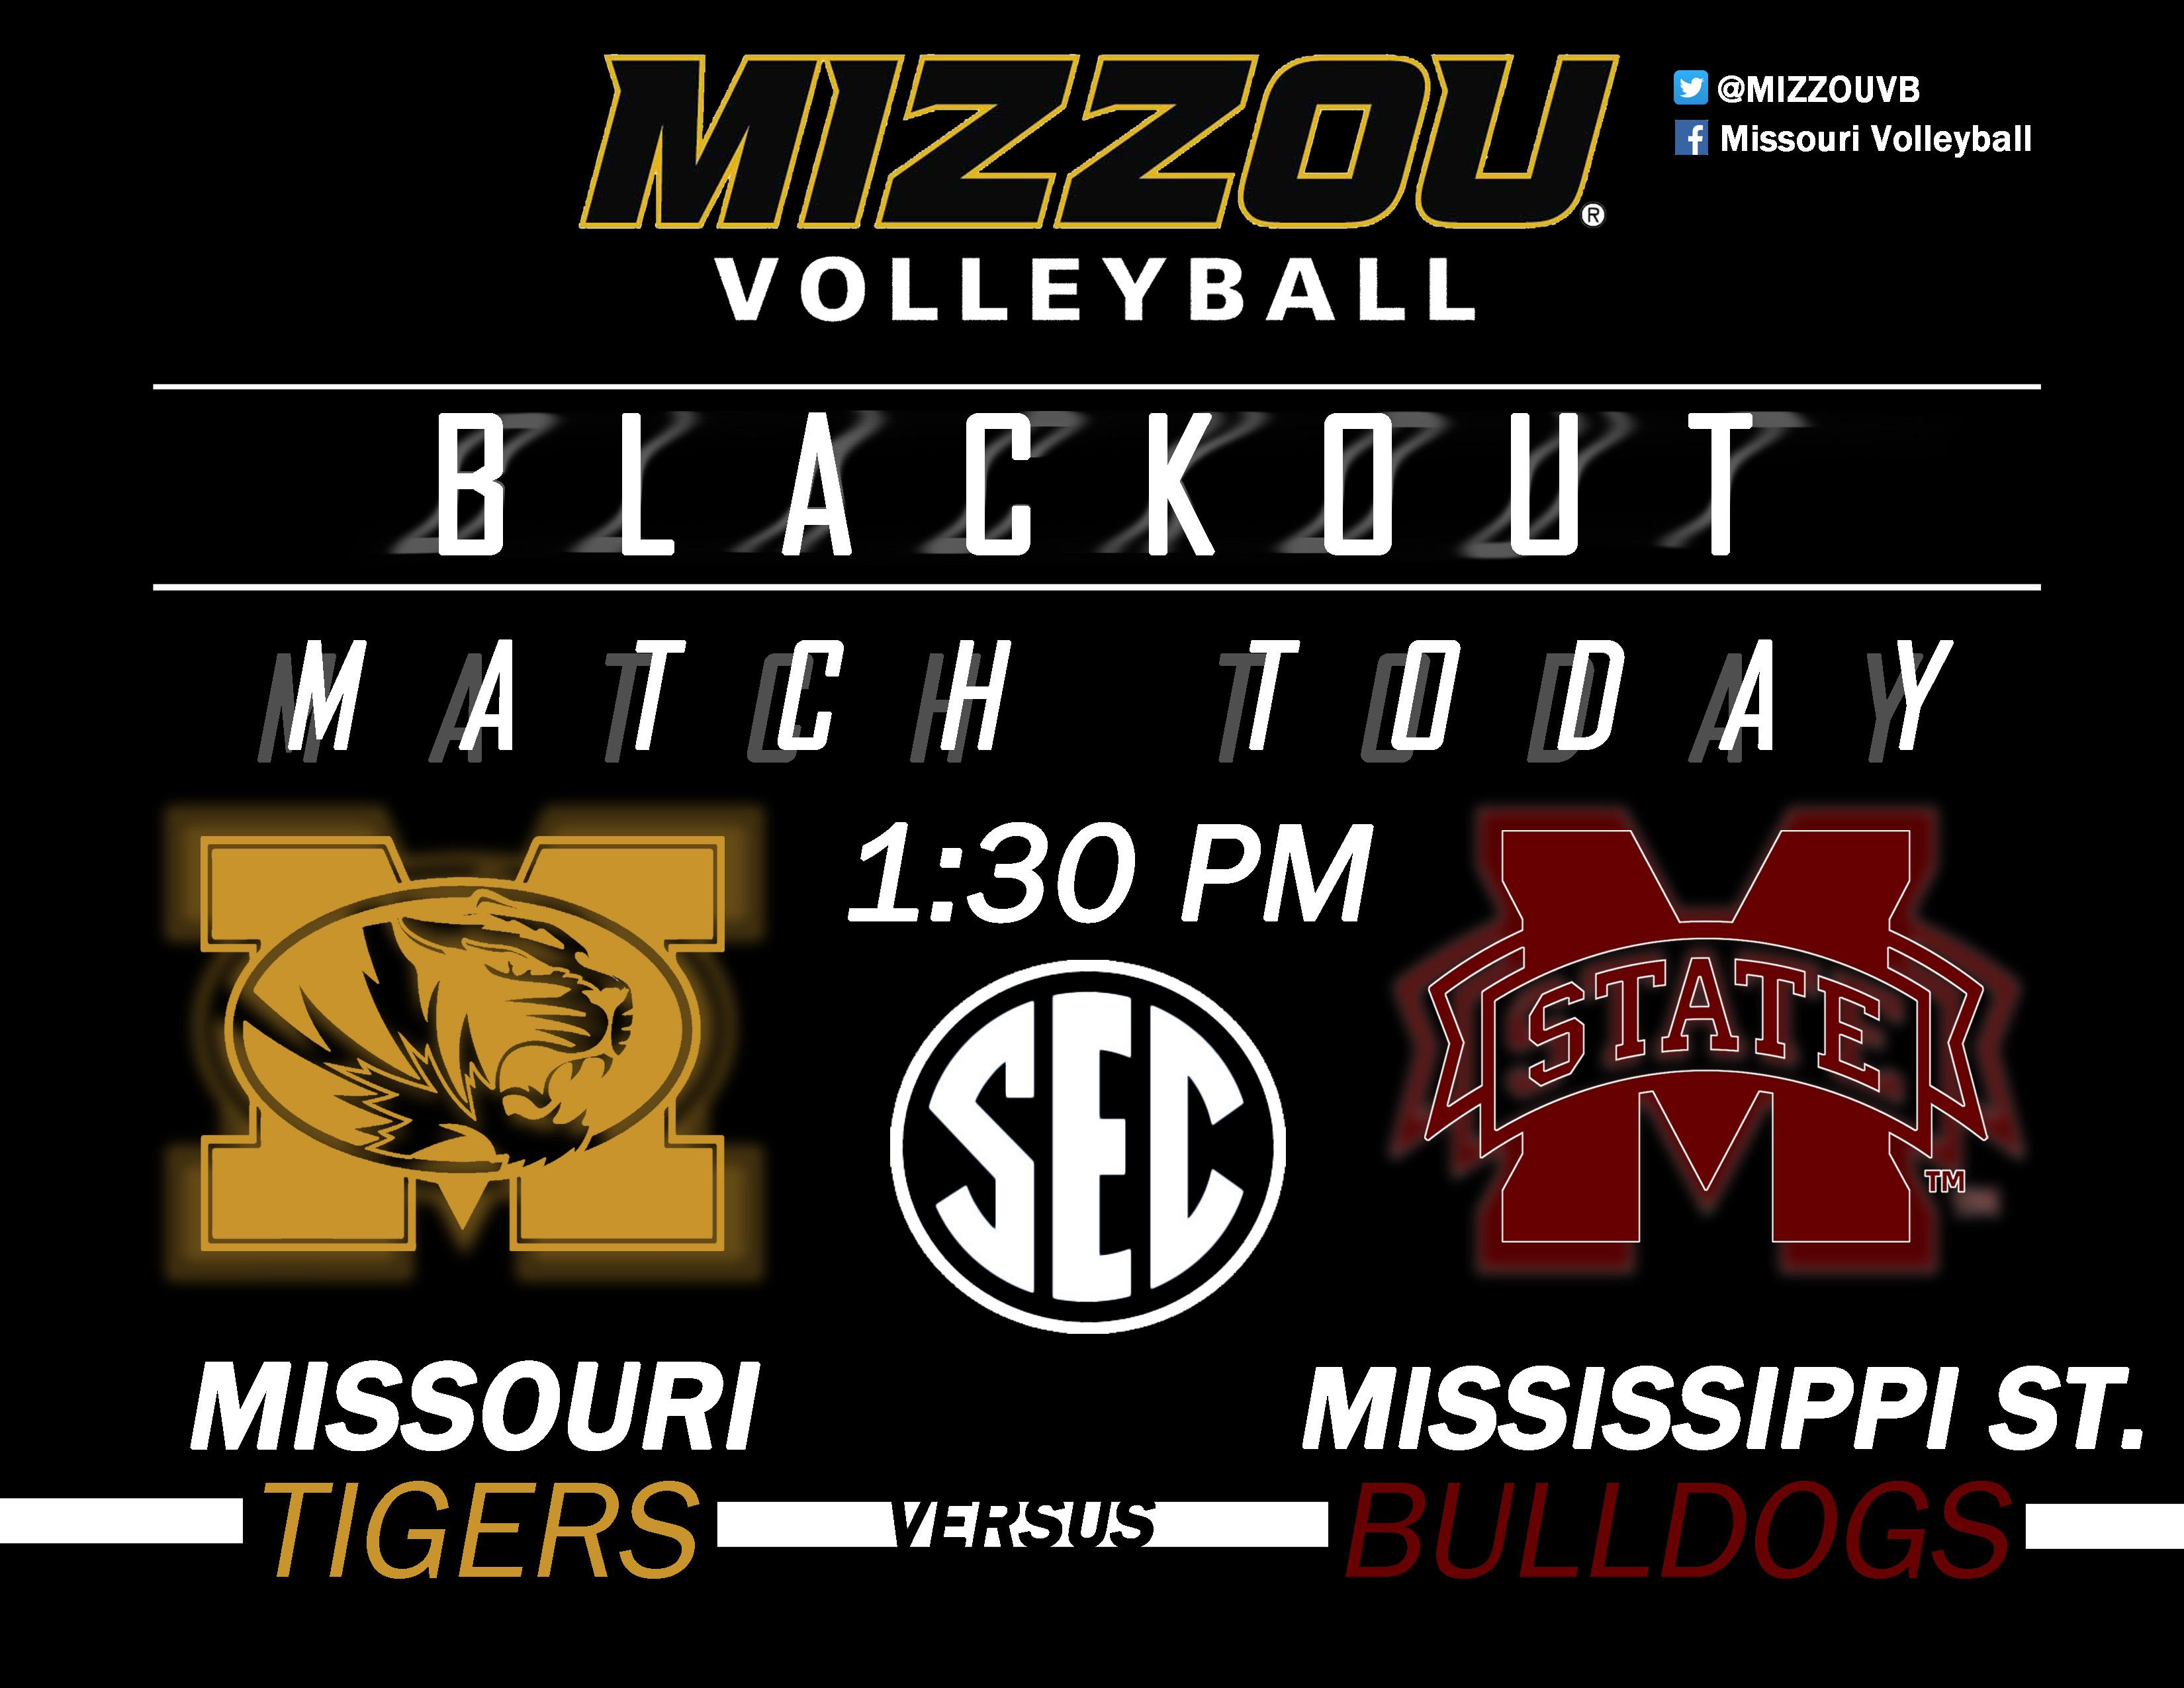 SEC Volleyball Match Flyer